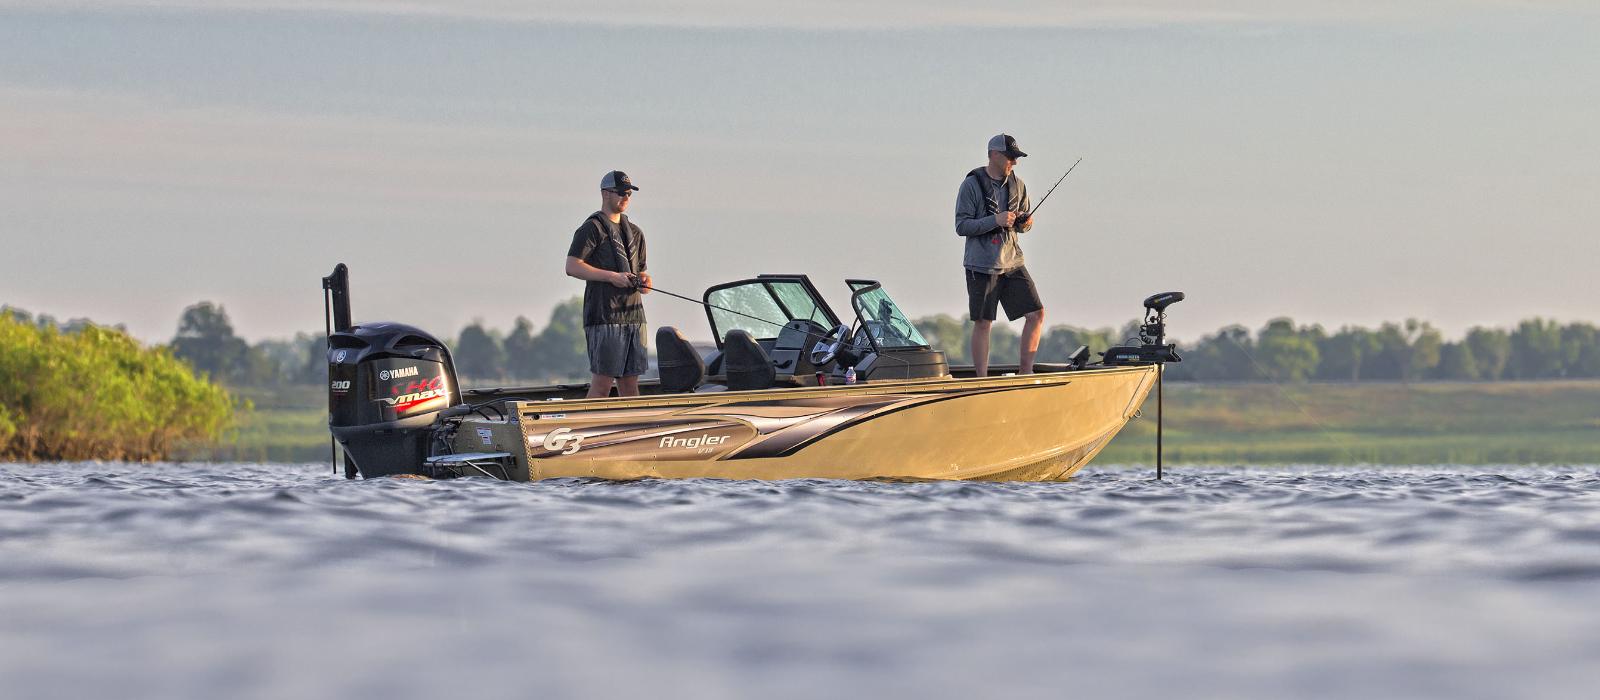 Angler V19 SF Fishing